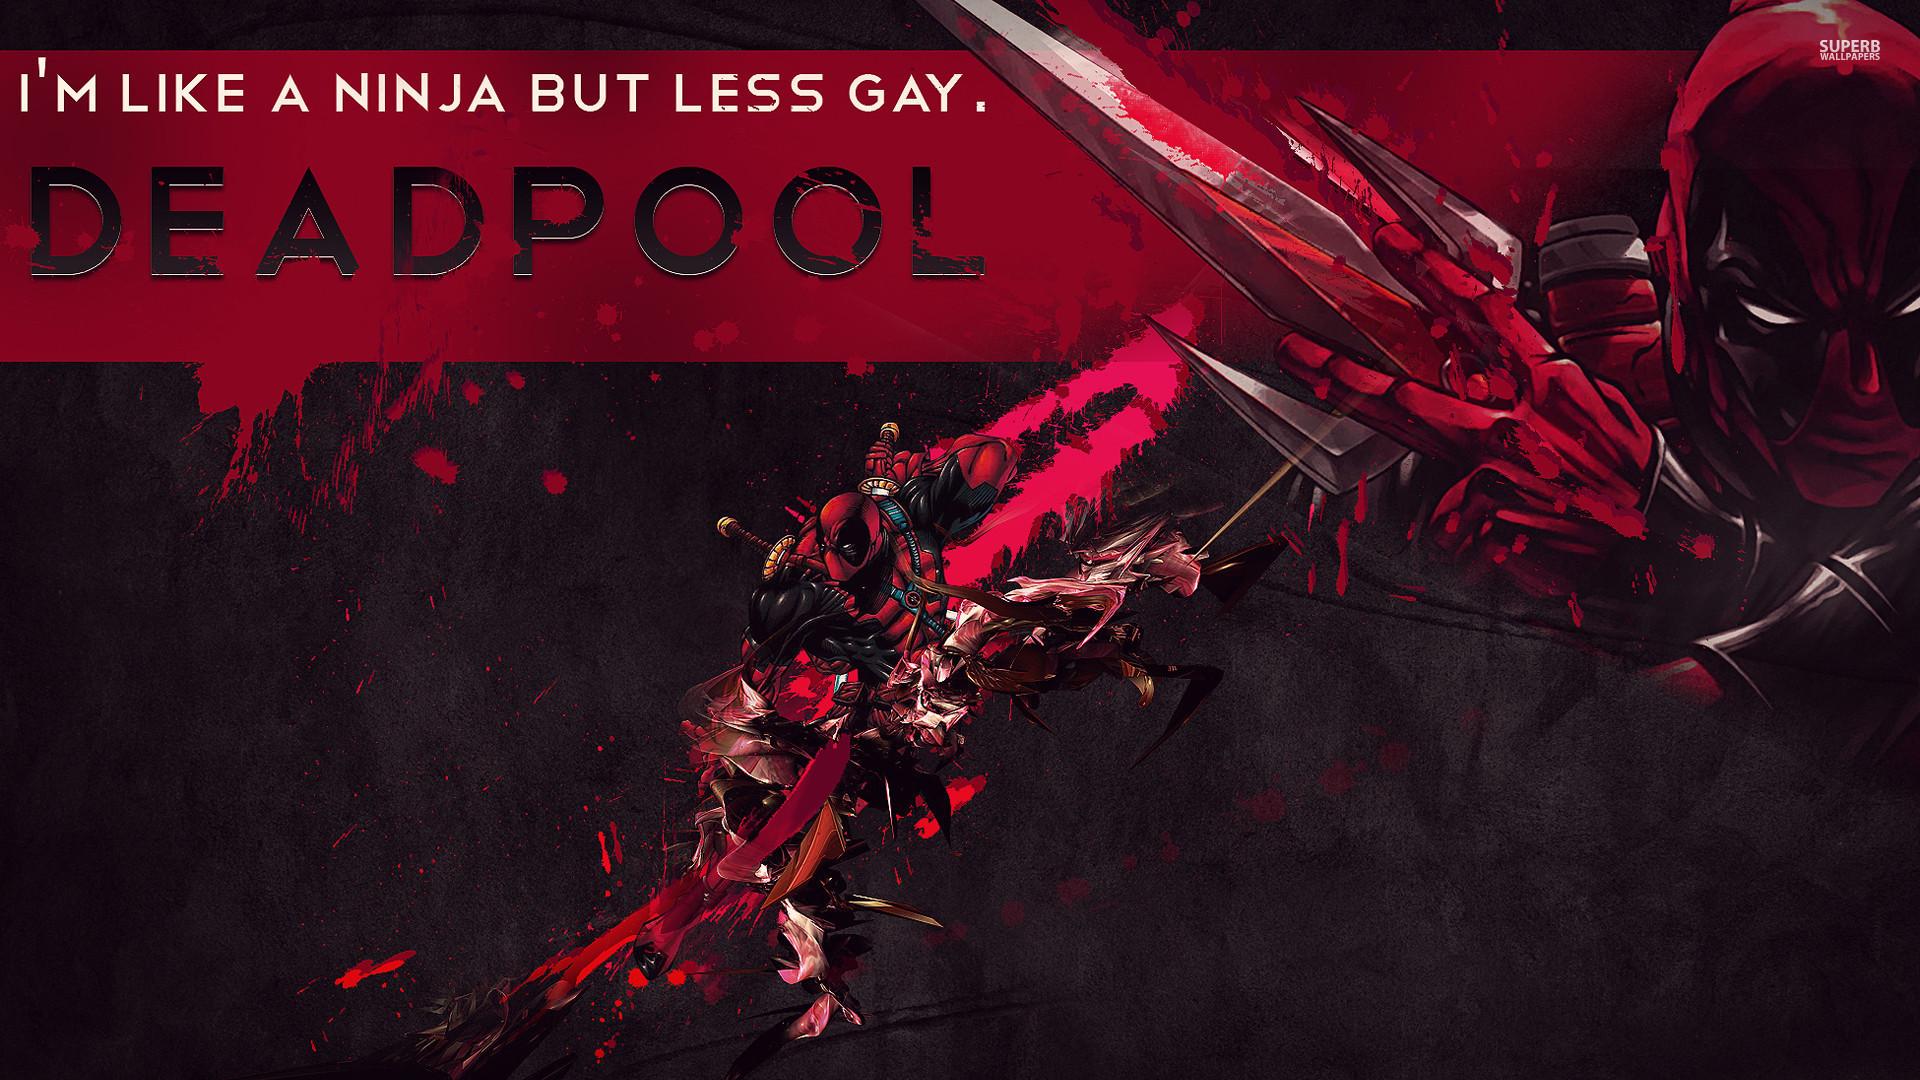 Full HD p Deadpool Wallpapers HD Desktop Backgrounds | HD Wallpapers |  Pinterest | Deadpool, Wallpaper and Desktop backgrounds